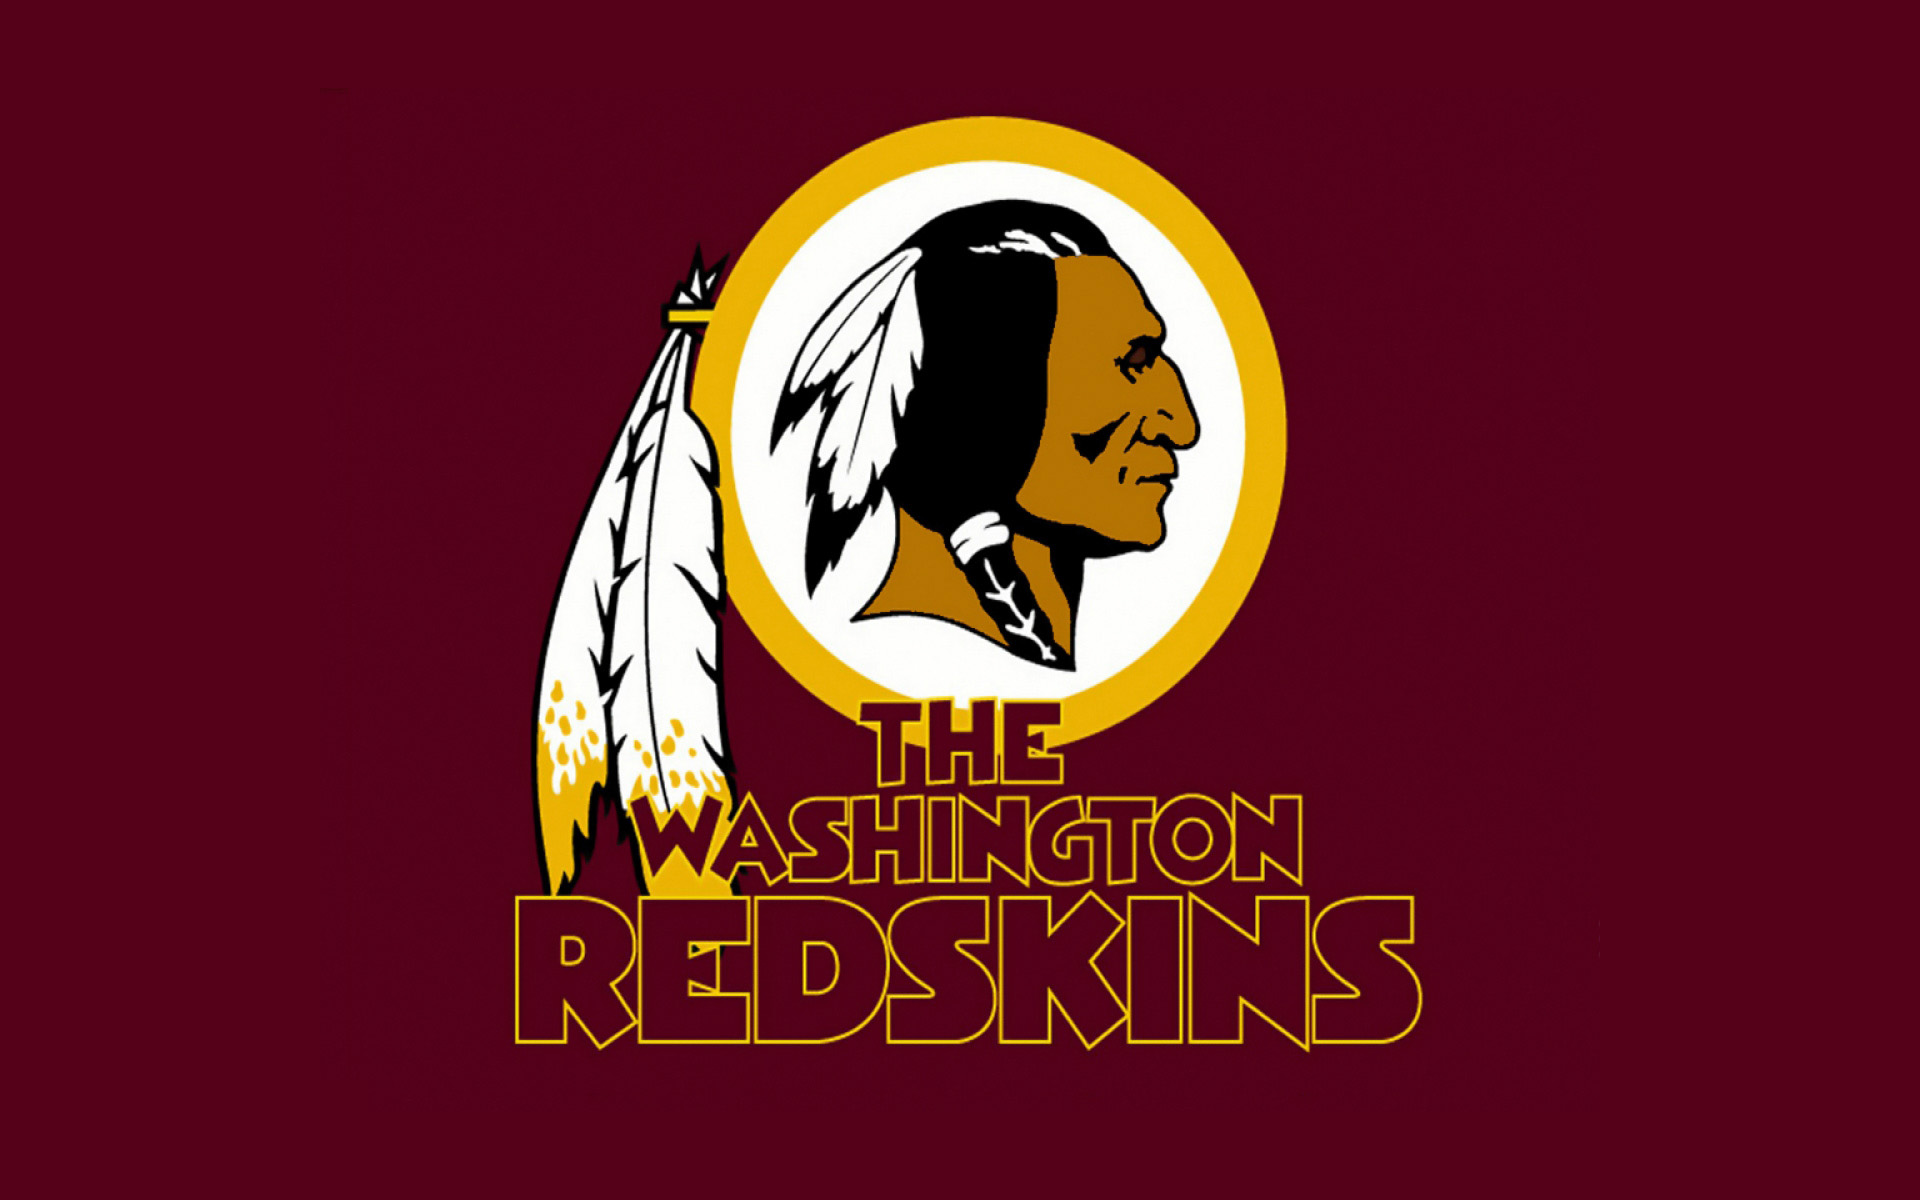 Washington Redskins Nfl 1920x1200 Wide Images 1920x1200